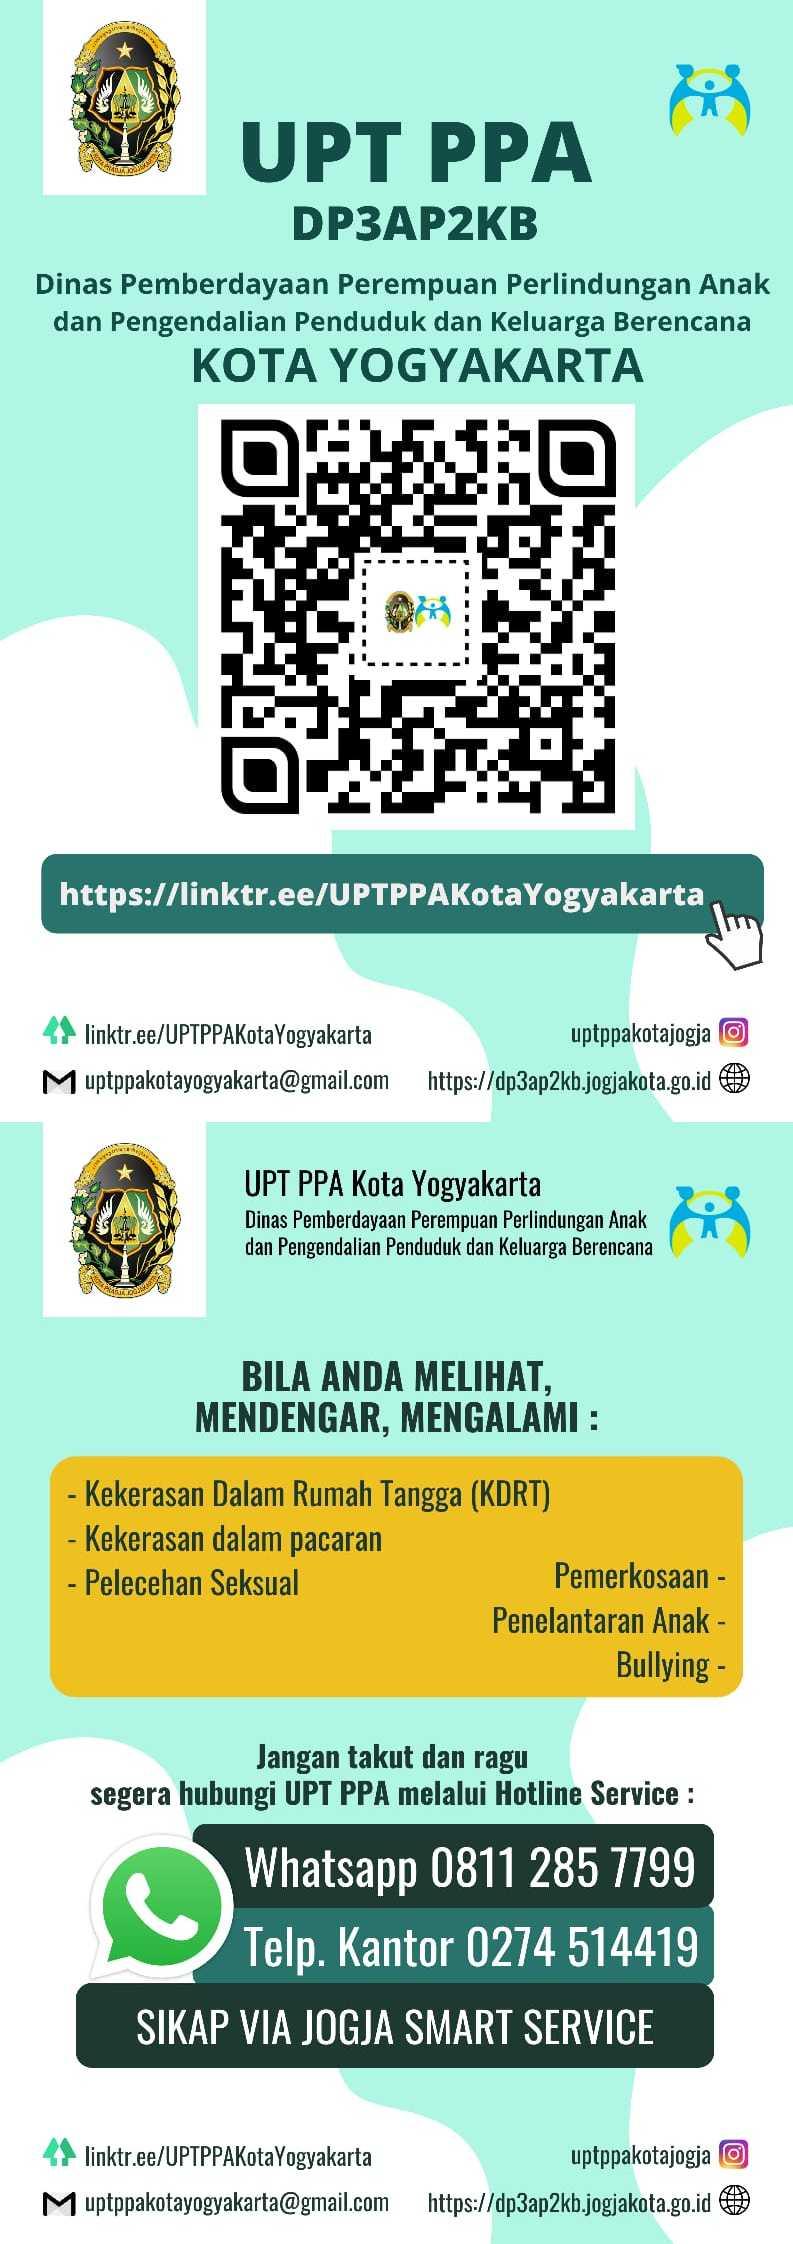 Pelayanan UPT PPA